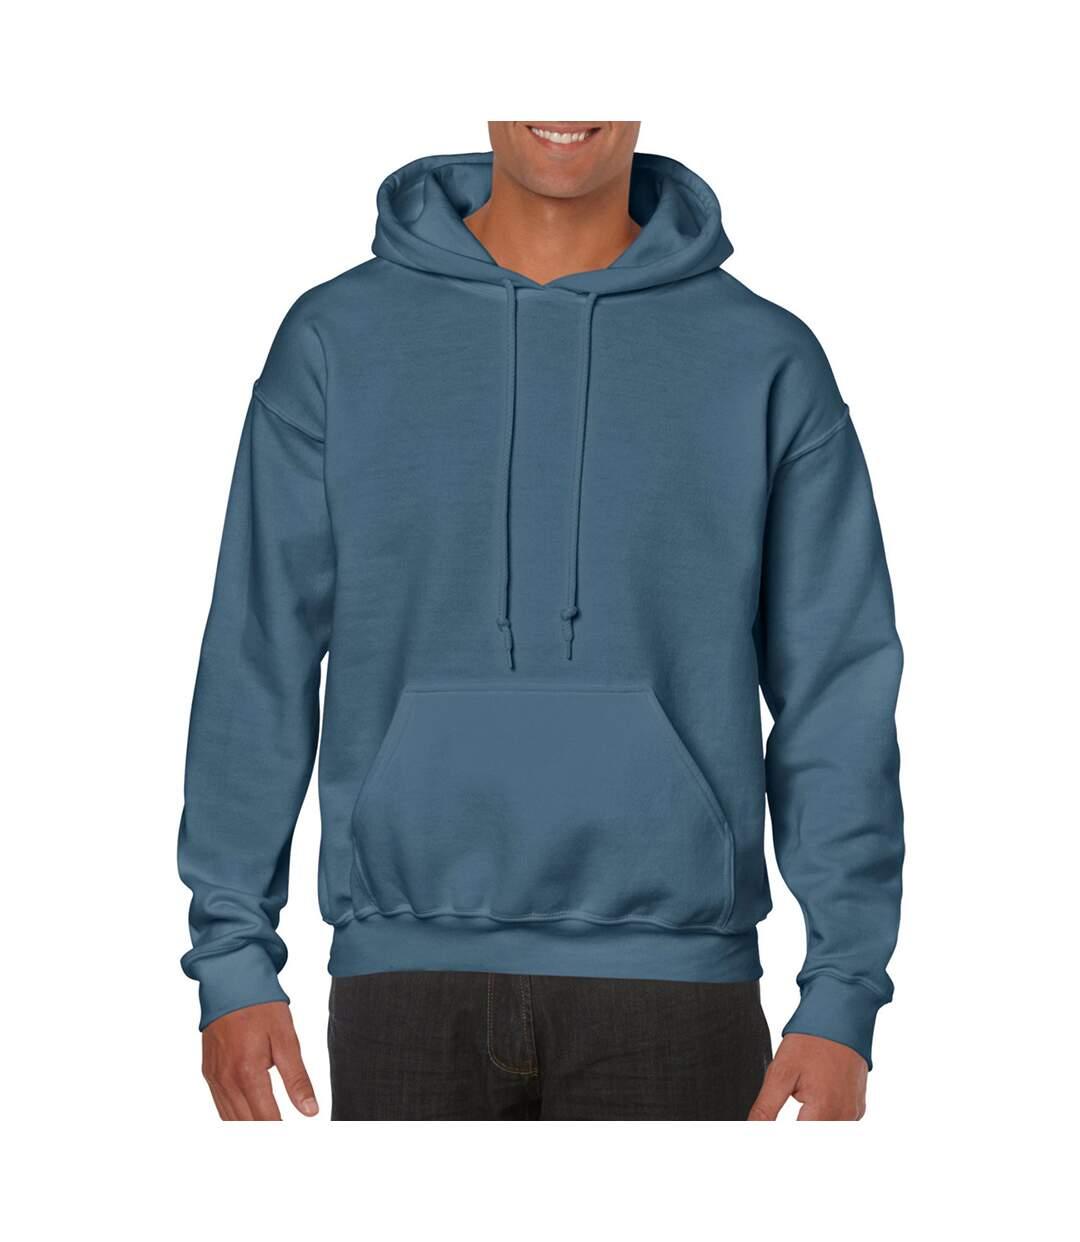 Gildan Heavy Blend Adult Unisex Hooded Sweatshirt / Hoodie (Light Pink) - UTBC468